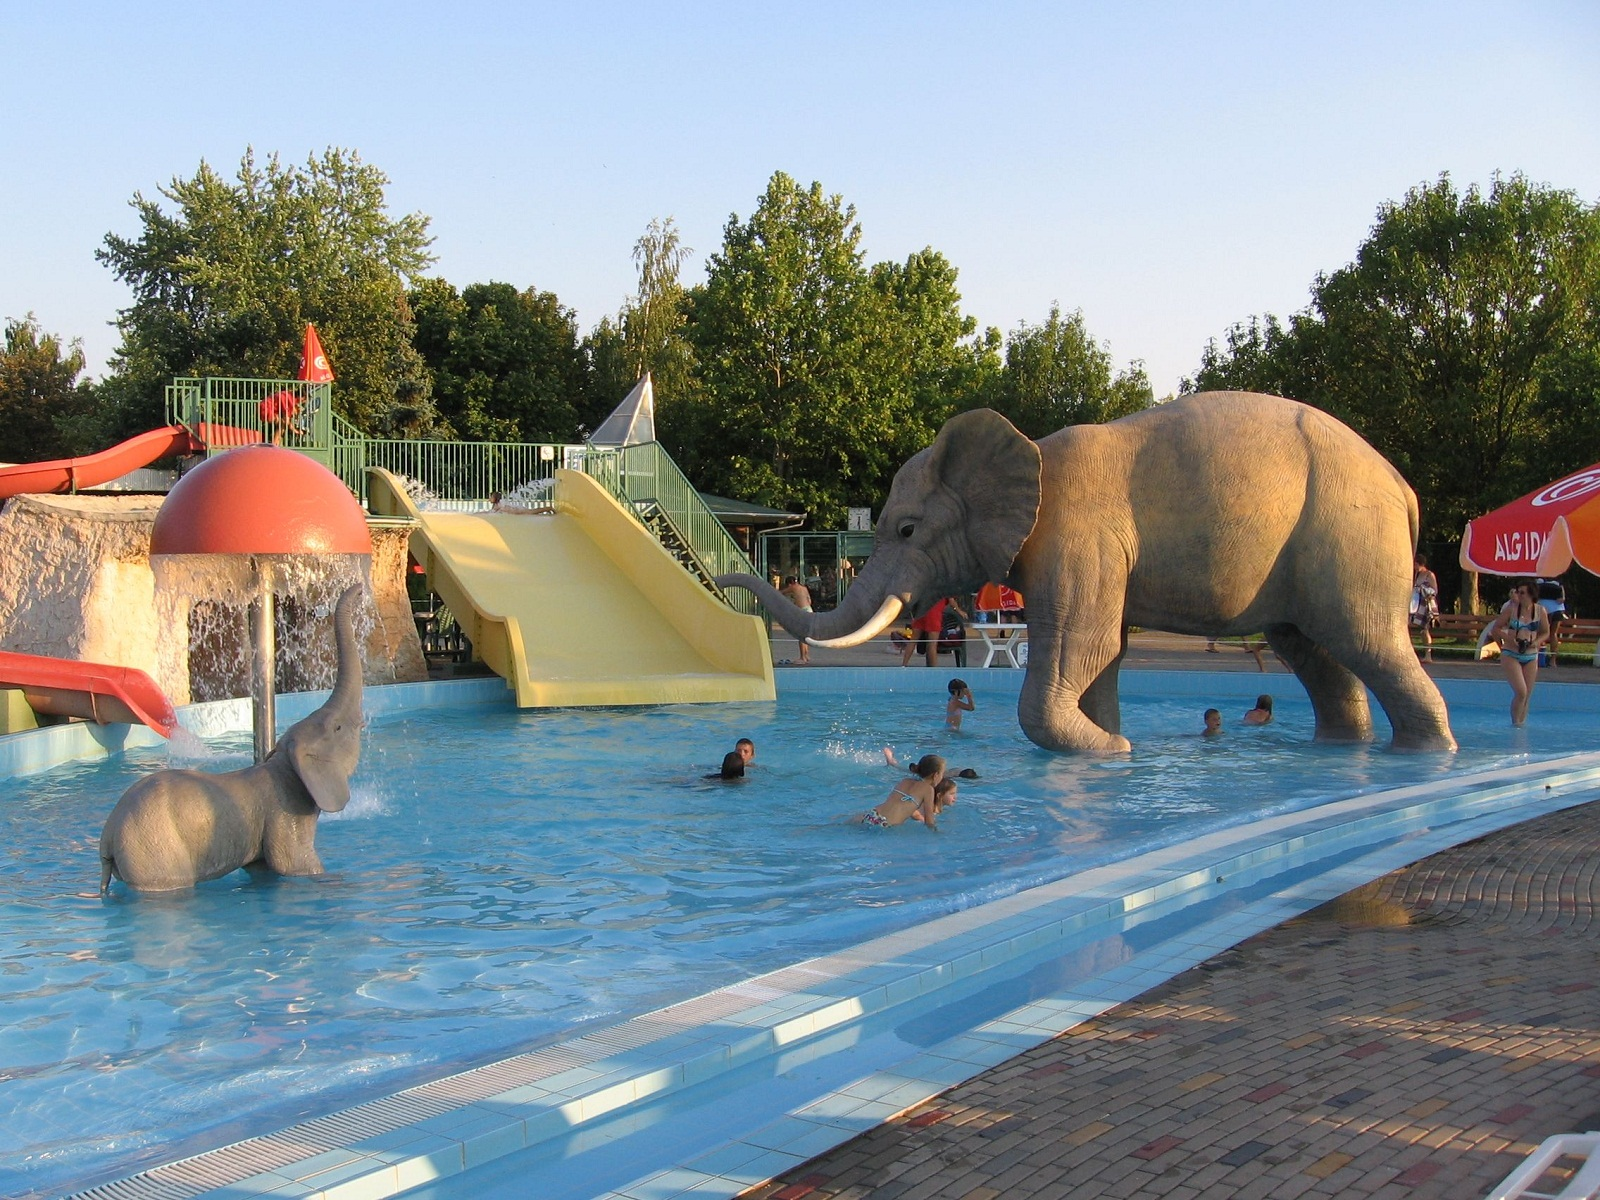 Hajduszoboszlo Hungary  city photos : Hajduszoboszlo, Hungary, Water Park with elephant statue